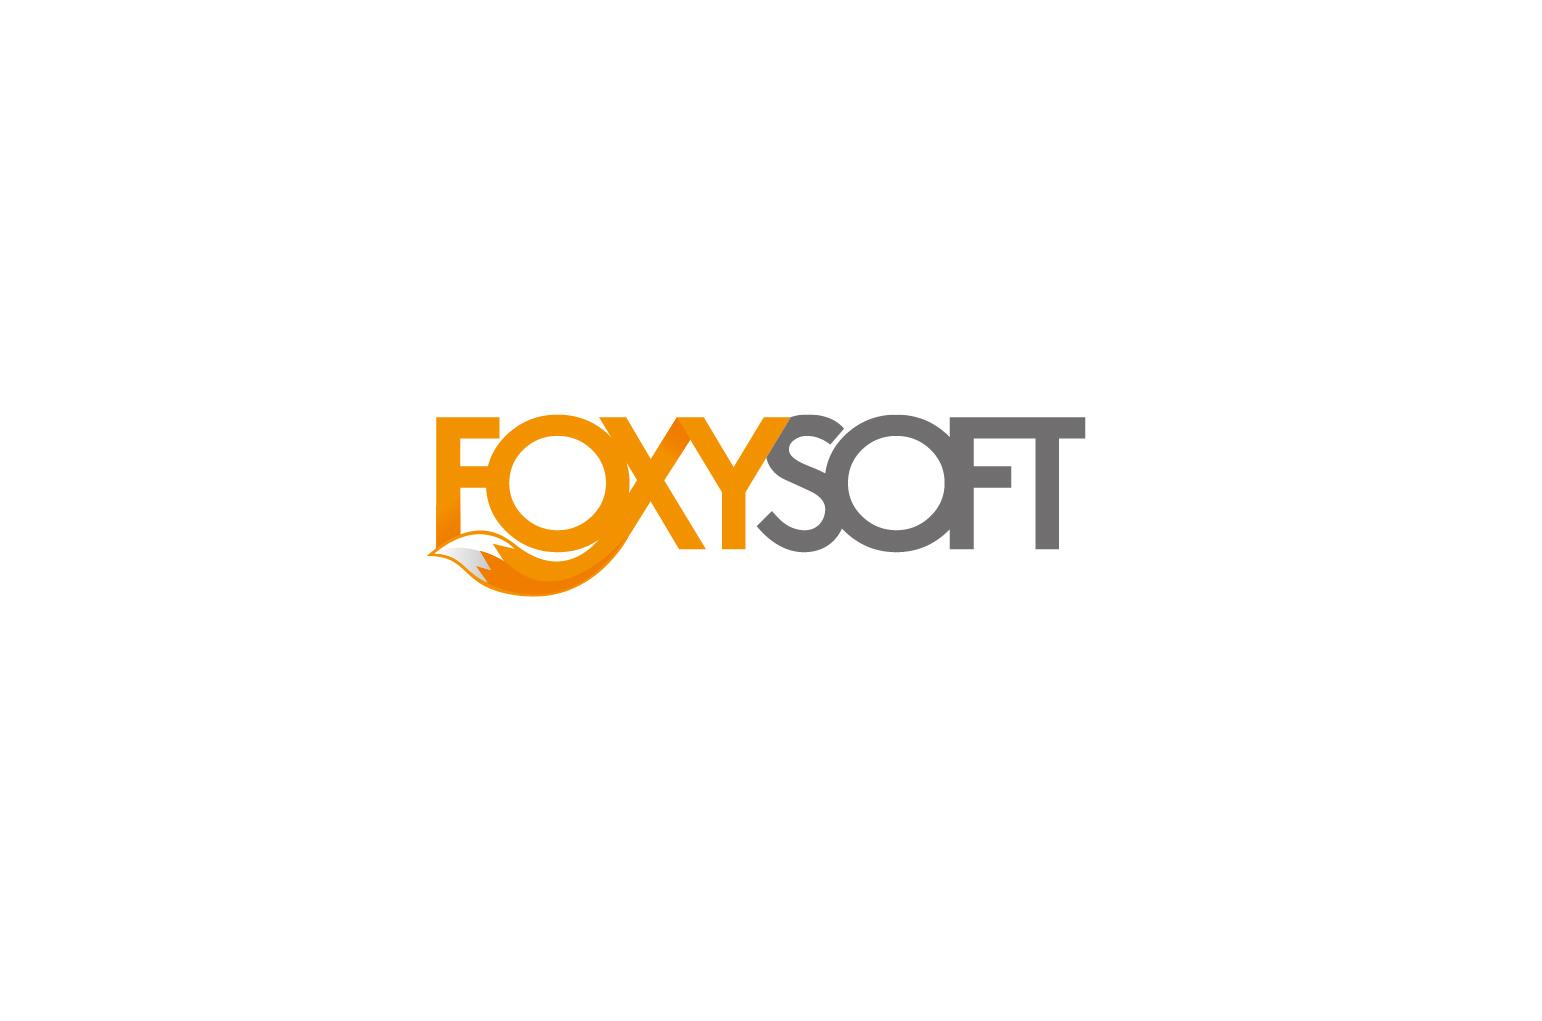 Foxysoft